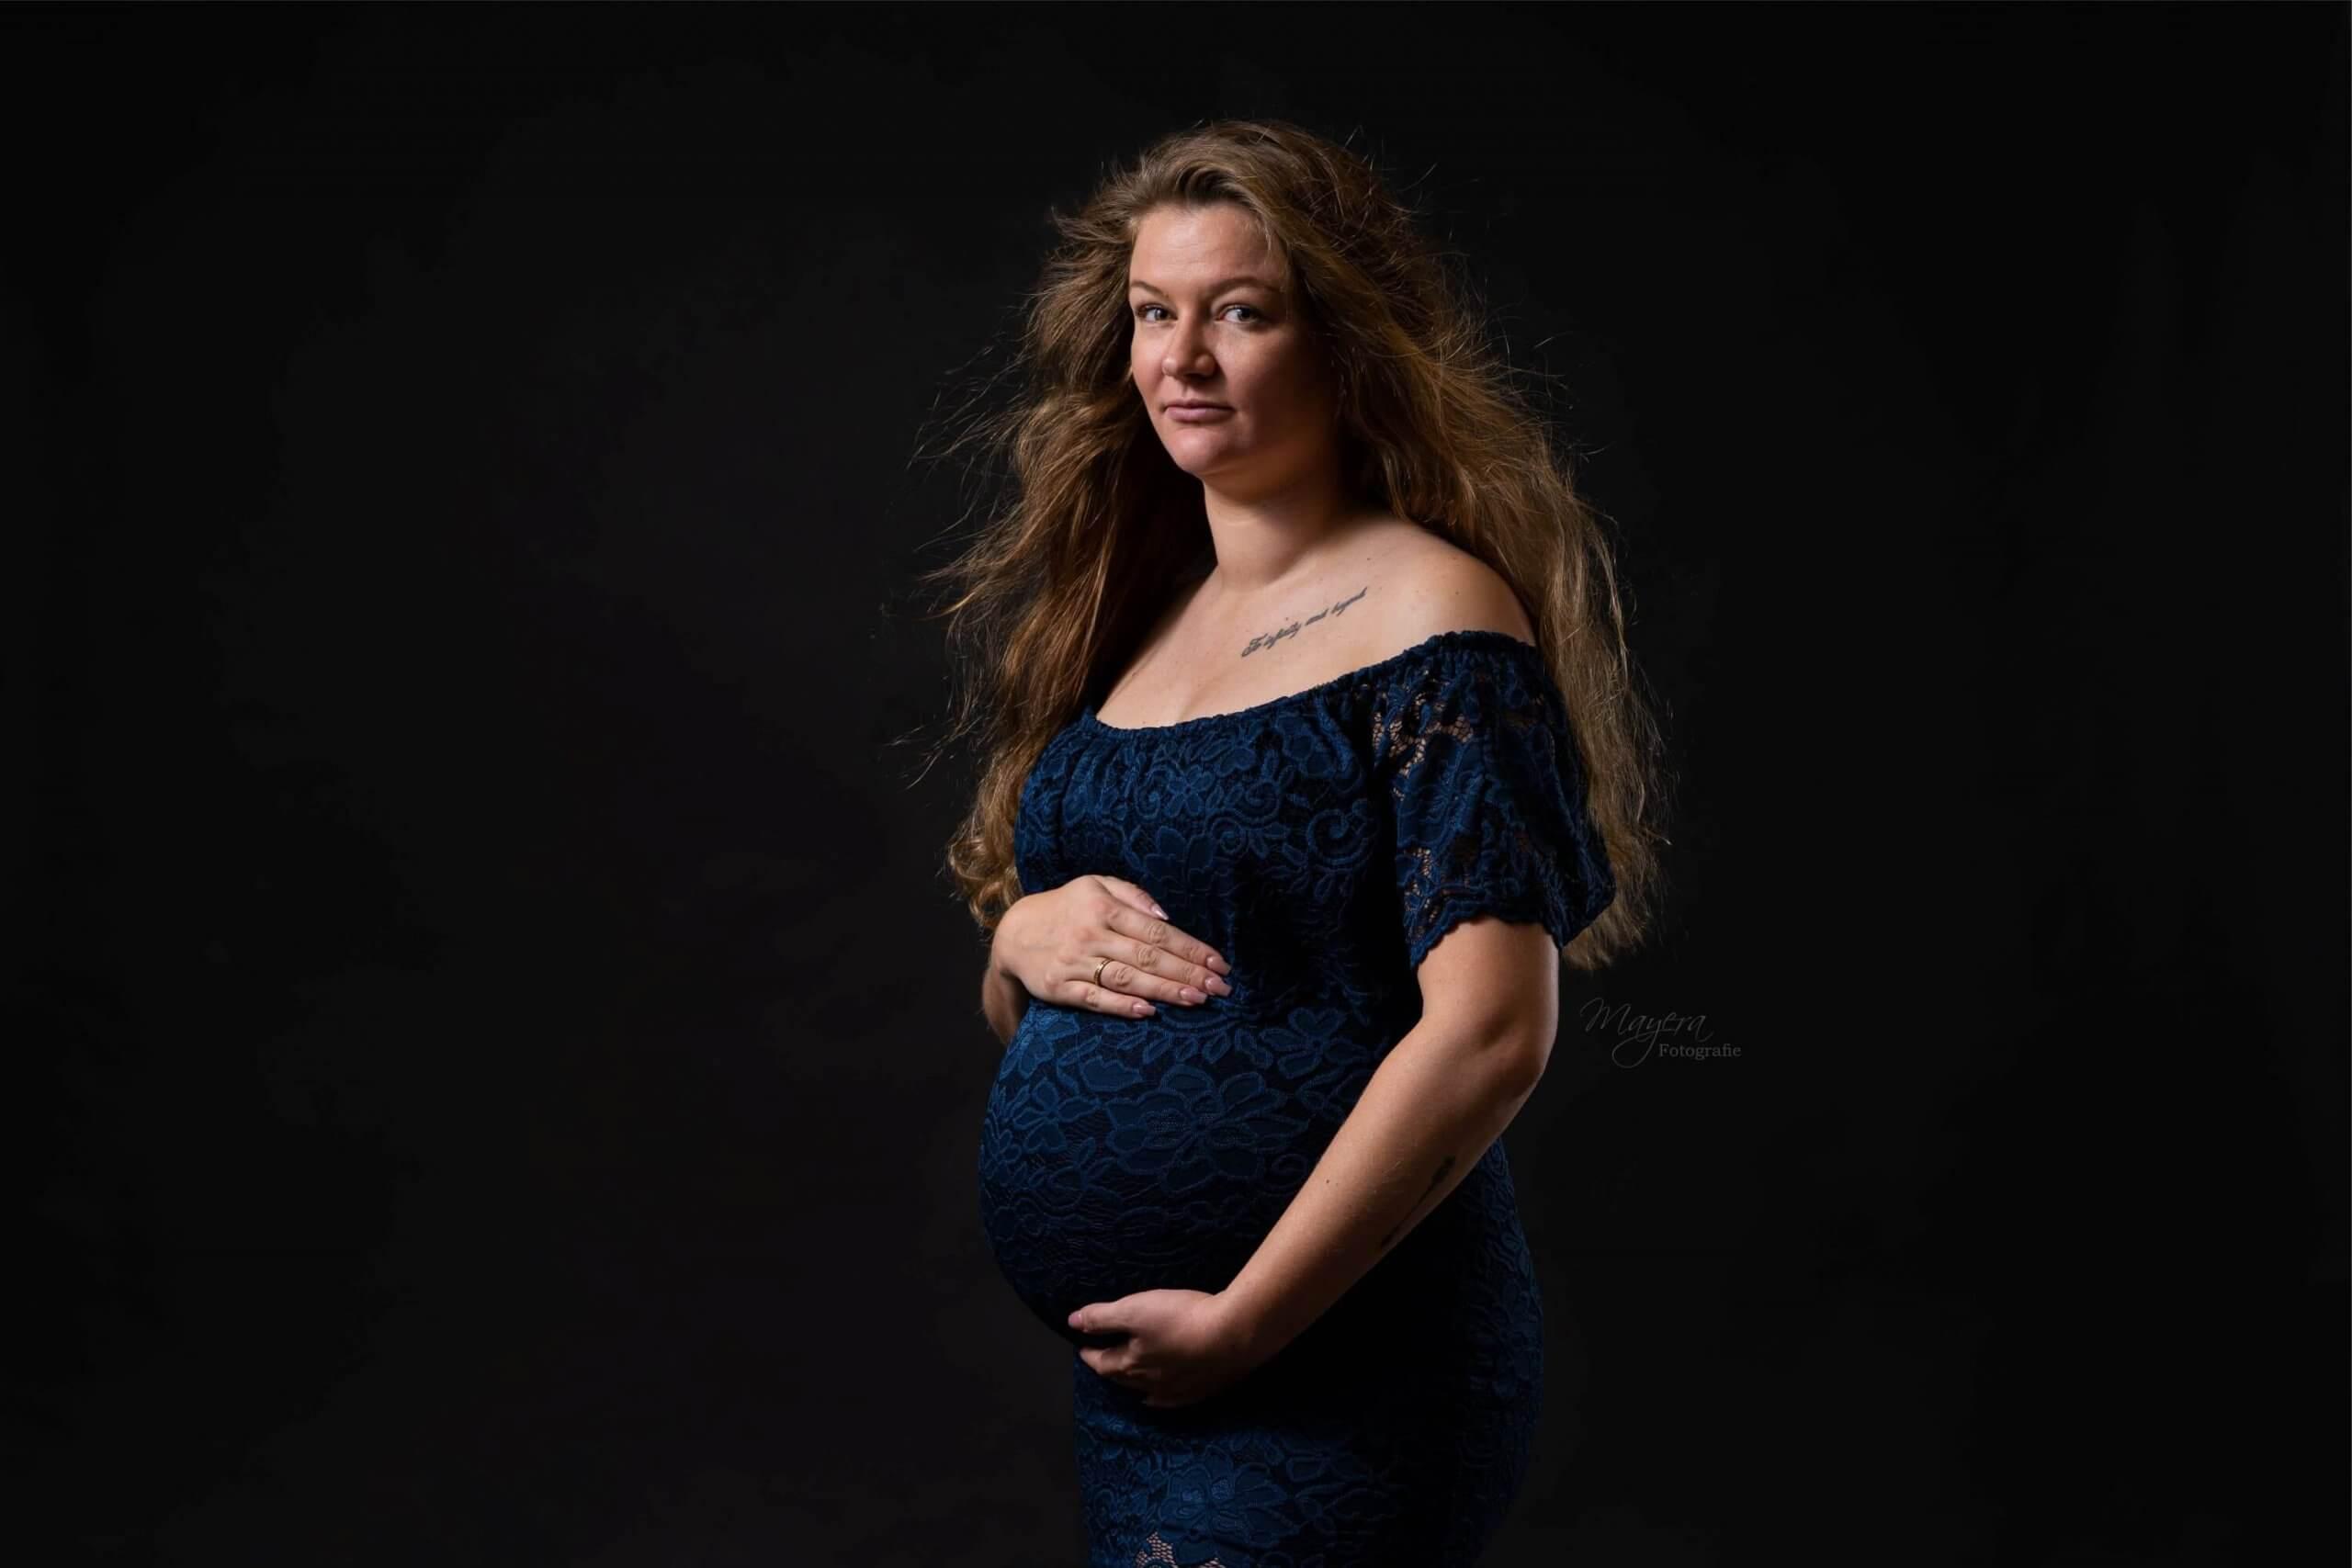 Garderobe studio fotoshoot dame moeder mommy momslife